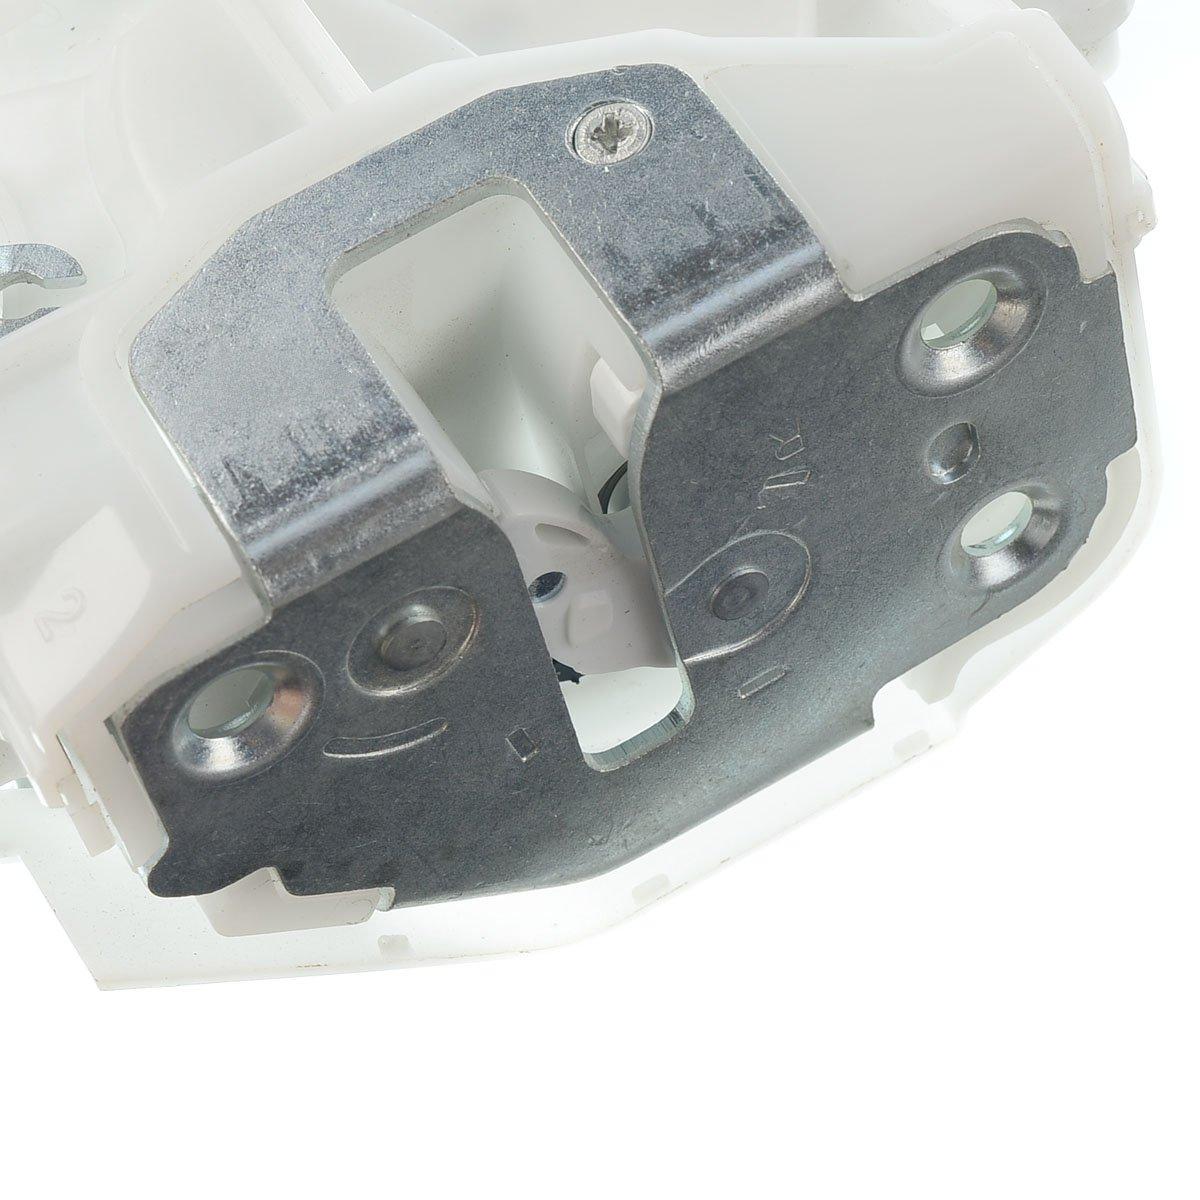 A-Premium Door Lock Actuator Motor for Honda Civic 2006-2011 Rear Left Driver Side